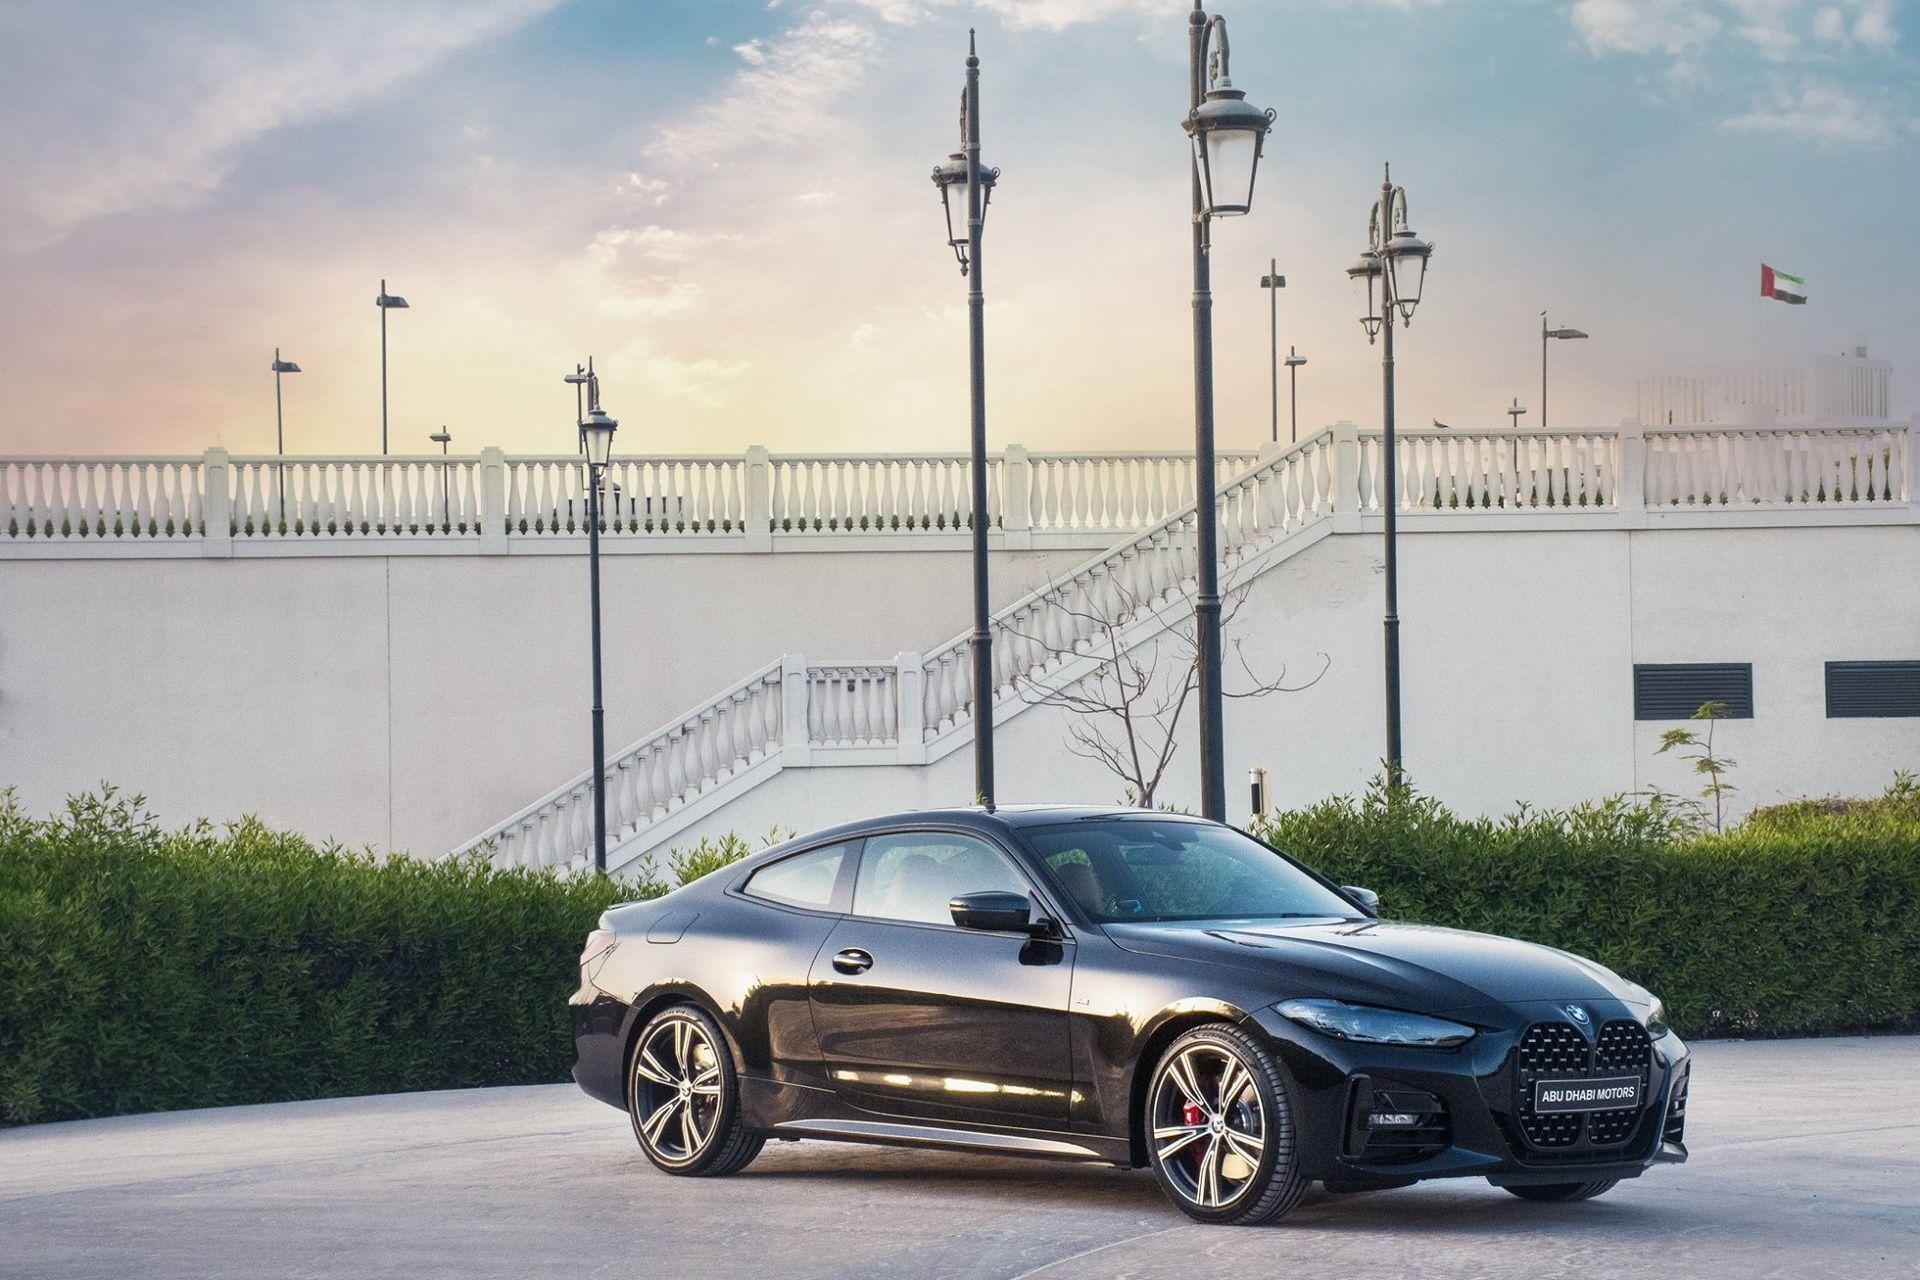 2021_BMW_4-Series_Coupe_Dark_Edition_UAE_0007